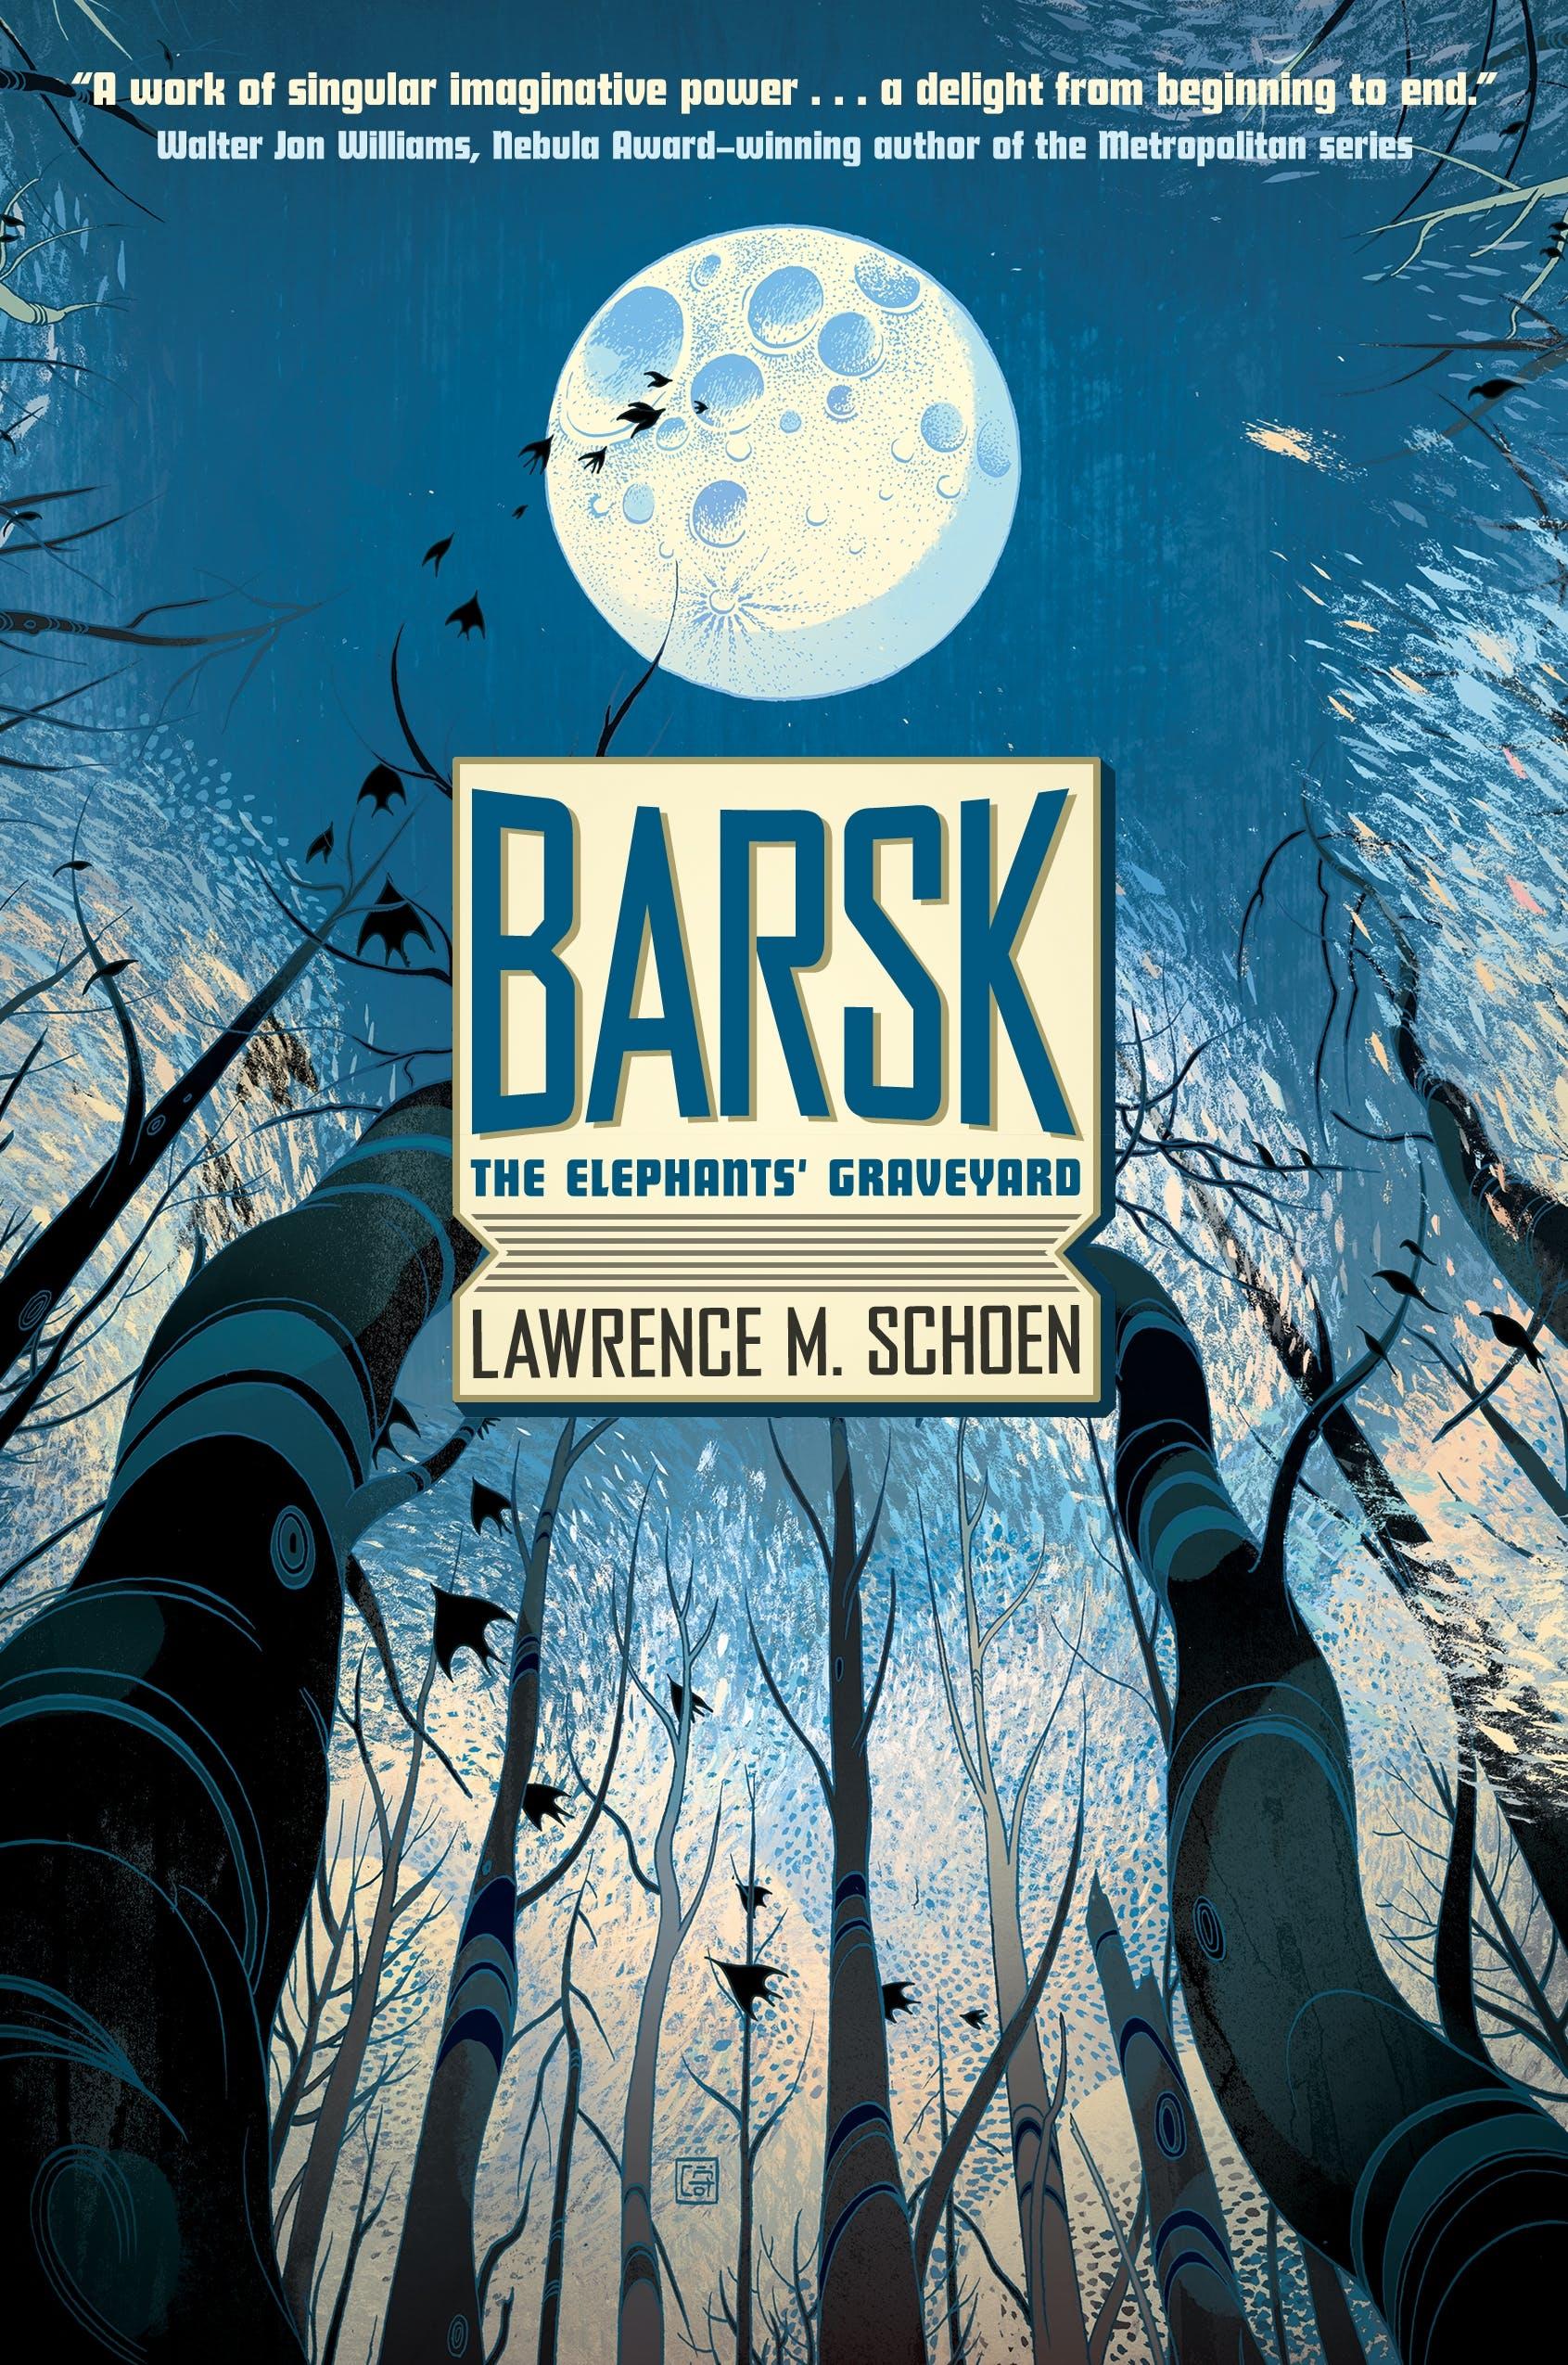 Image of Barsk: The Elephants' Graveyard